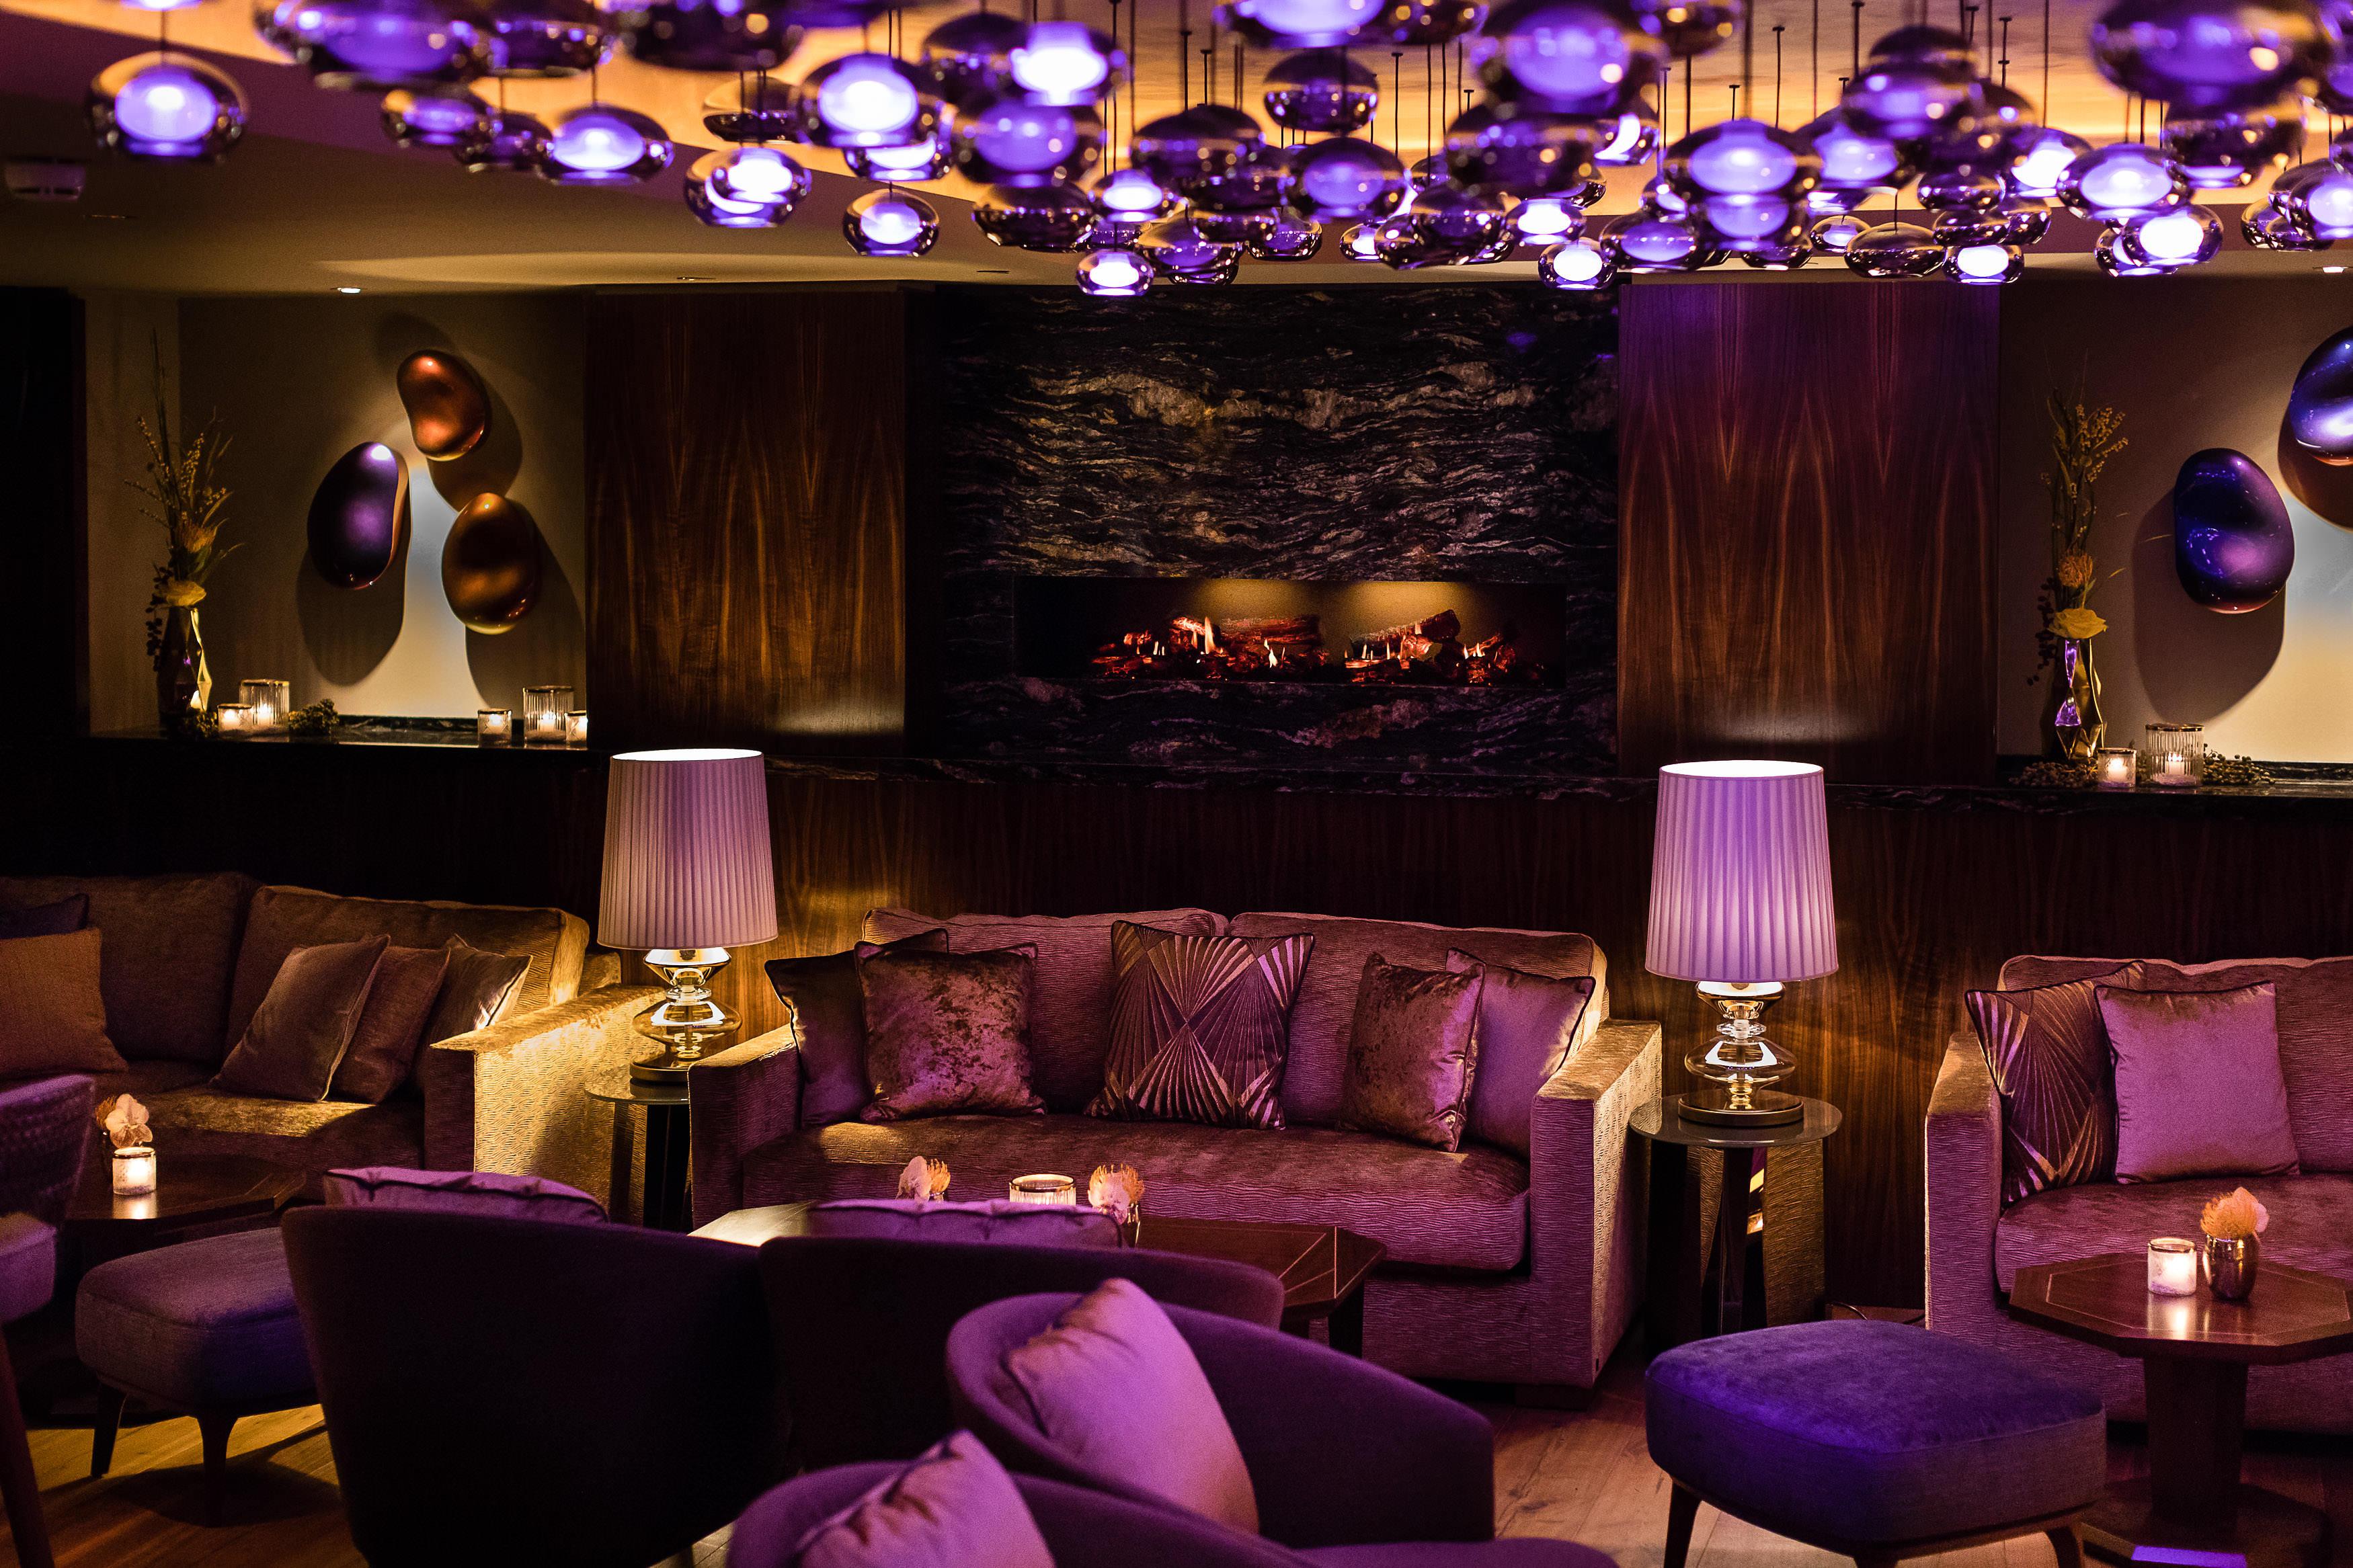 fairmont-hotel-vier-jahreszeiten-hamburg-nikkei-nine-lounge-1-guido-leifhelm